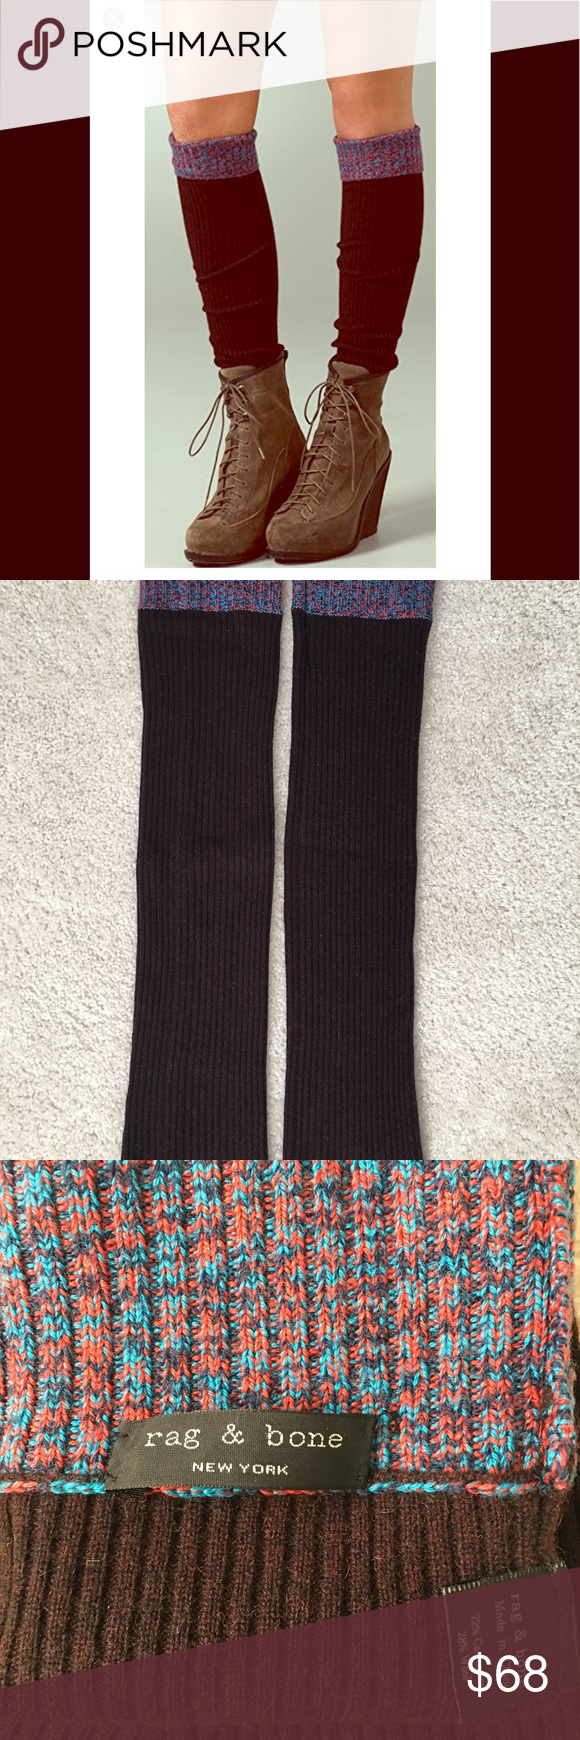 Rag & Bone Shoreditch Cashmere & Wool Leg Warmers